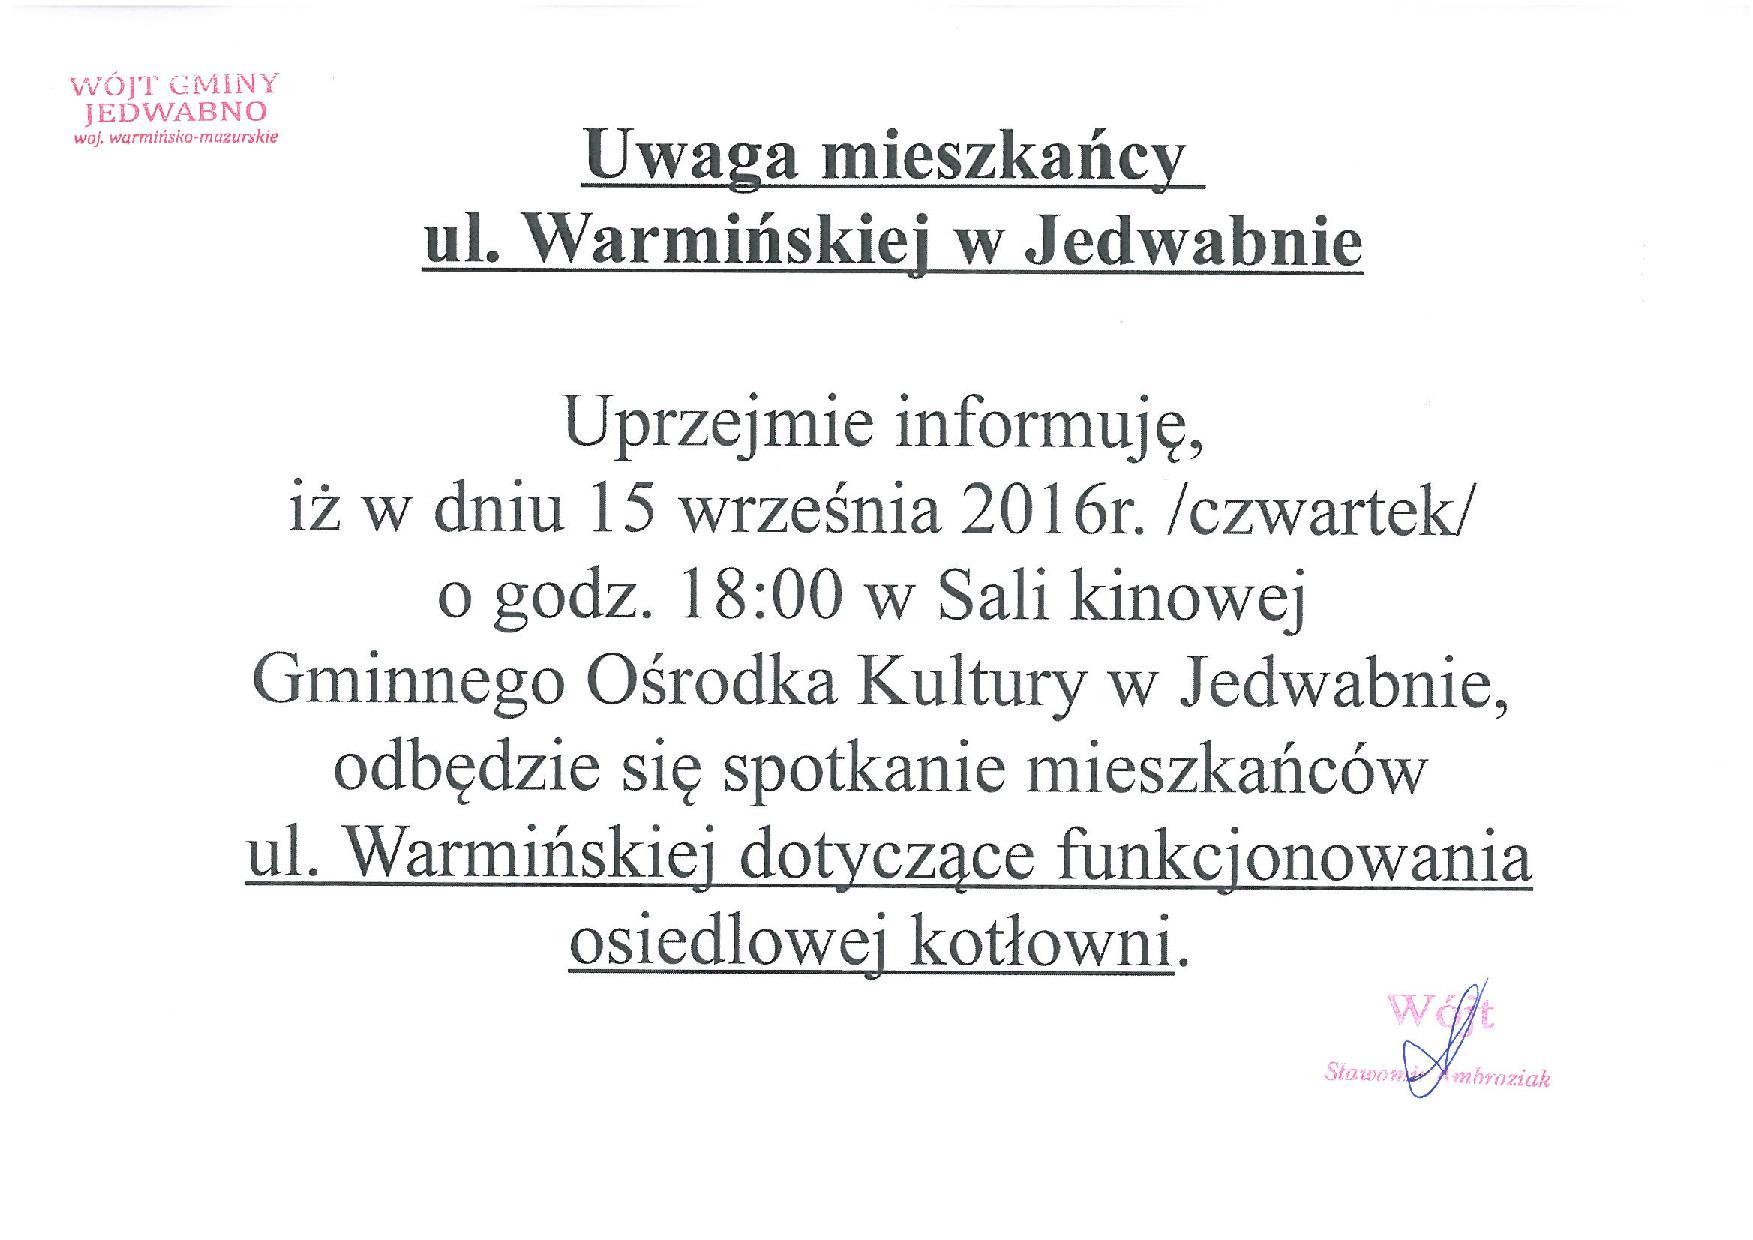 skmbt_c220-16091209361-page-001